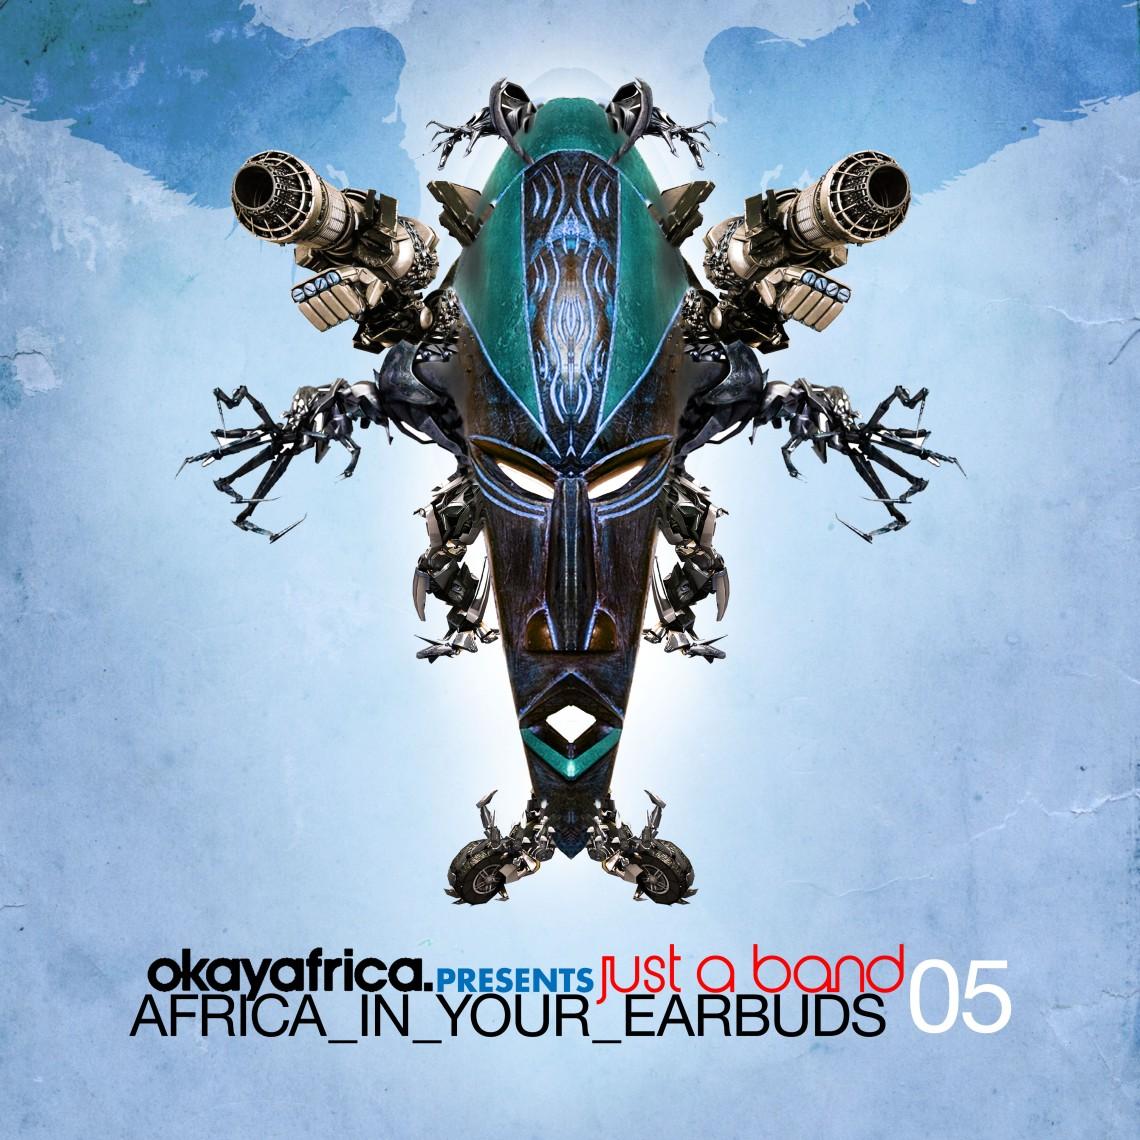 just a band okayafrica